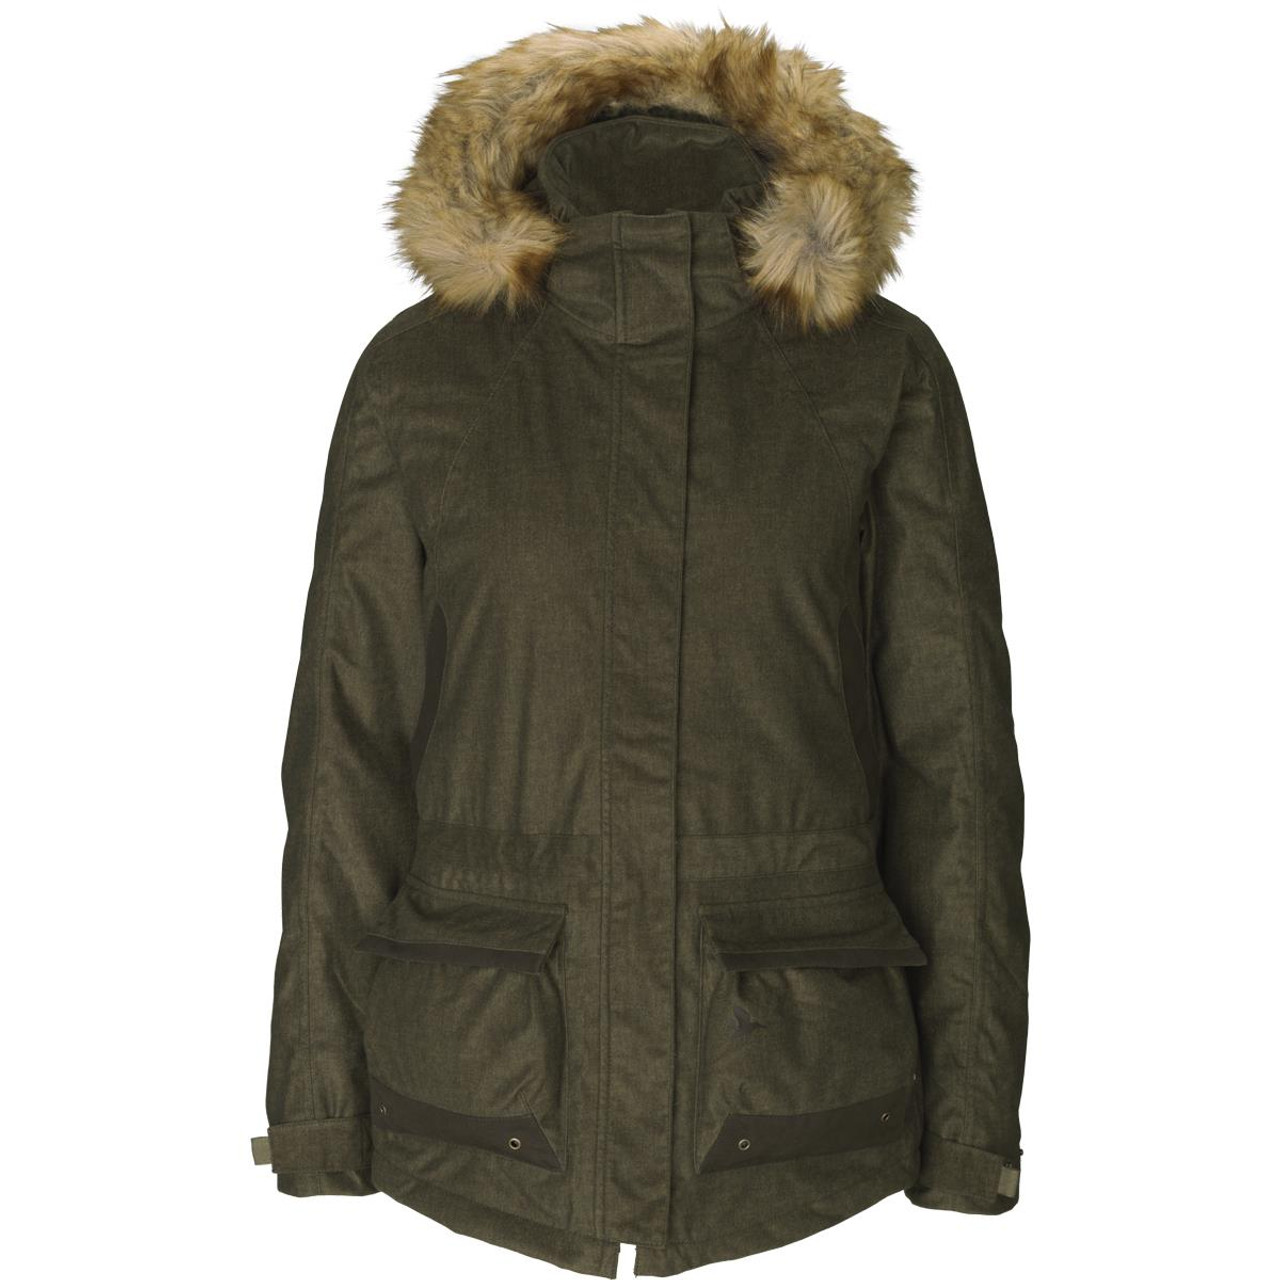 Seeland North Lady Jacket